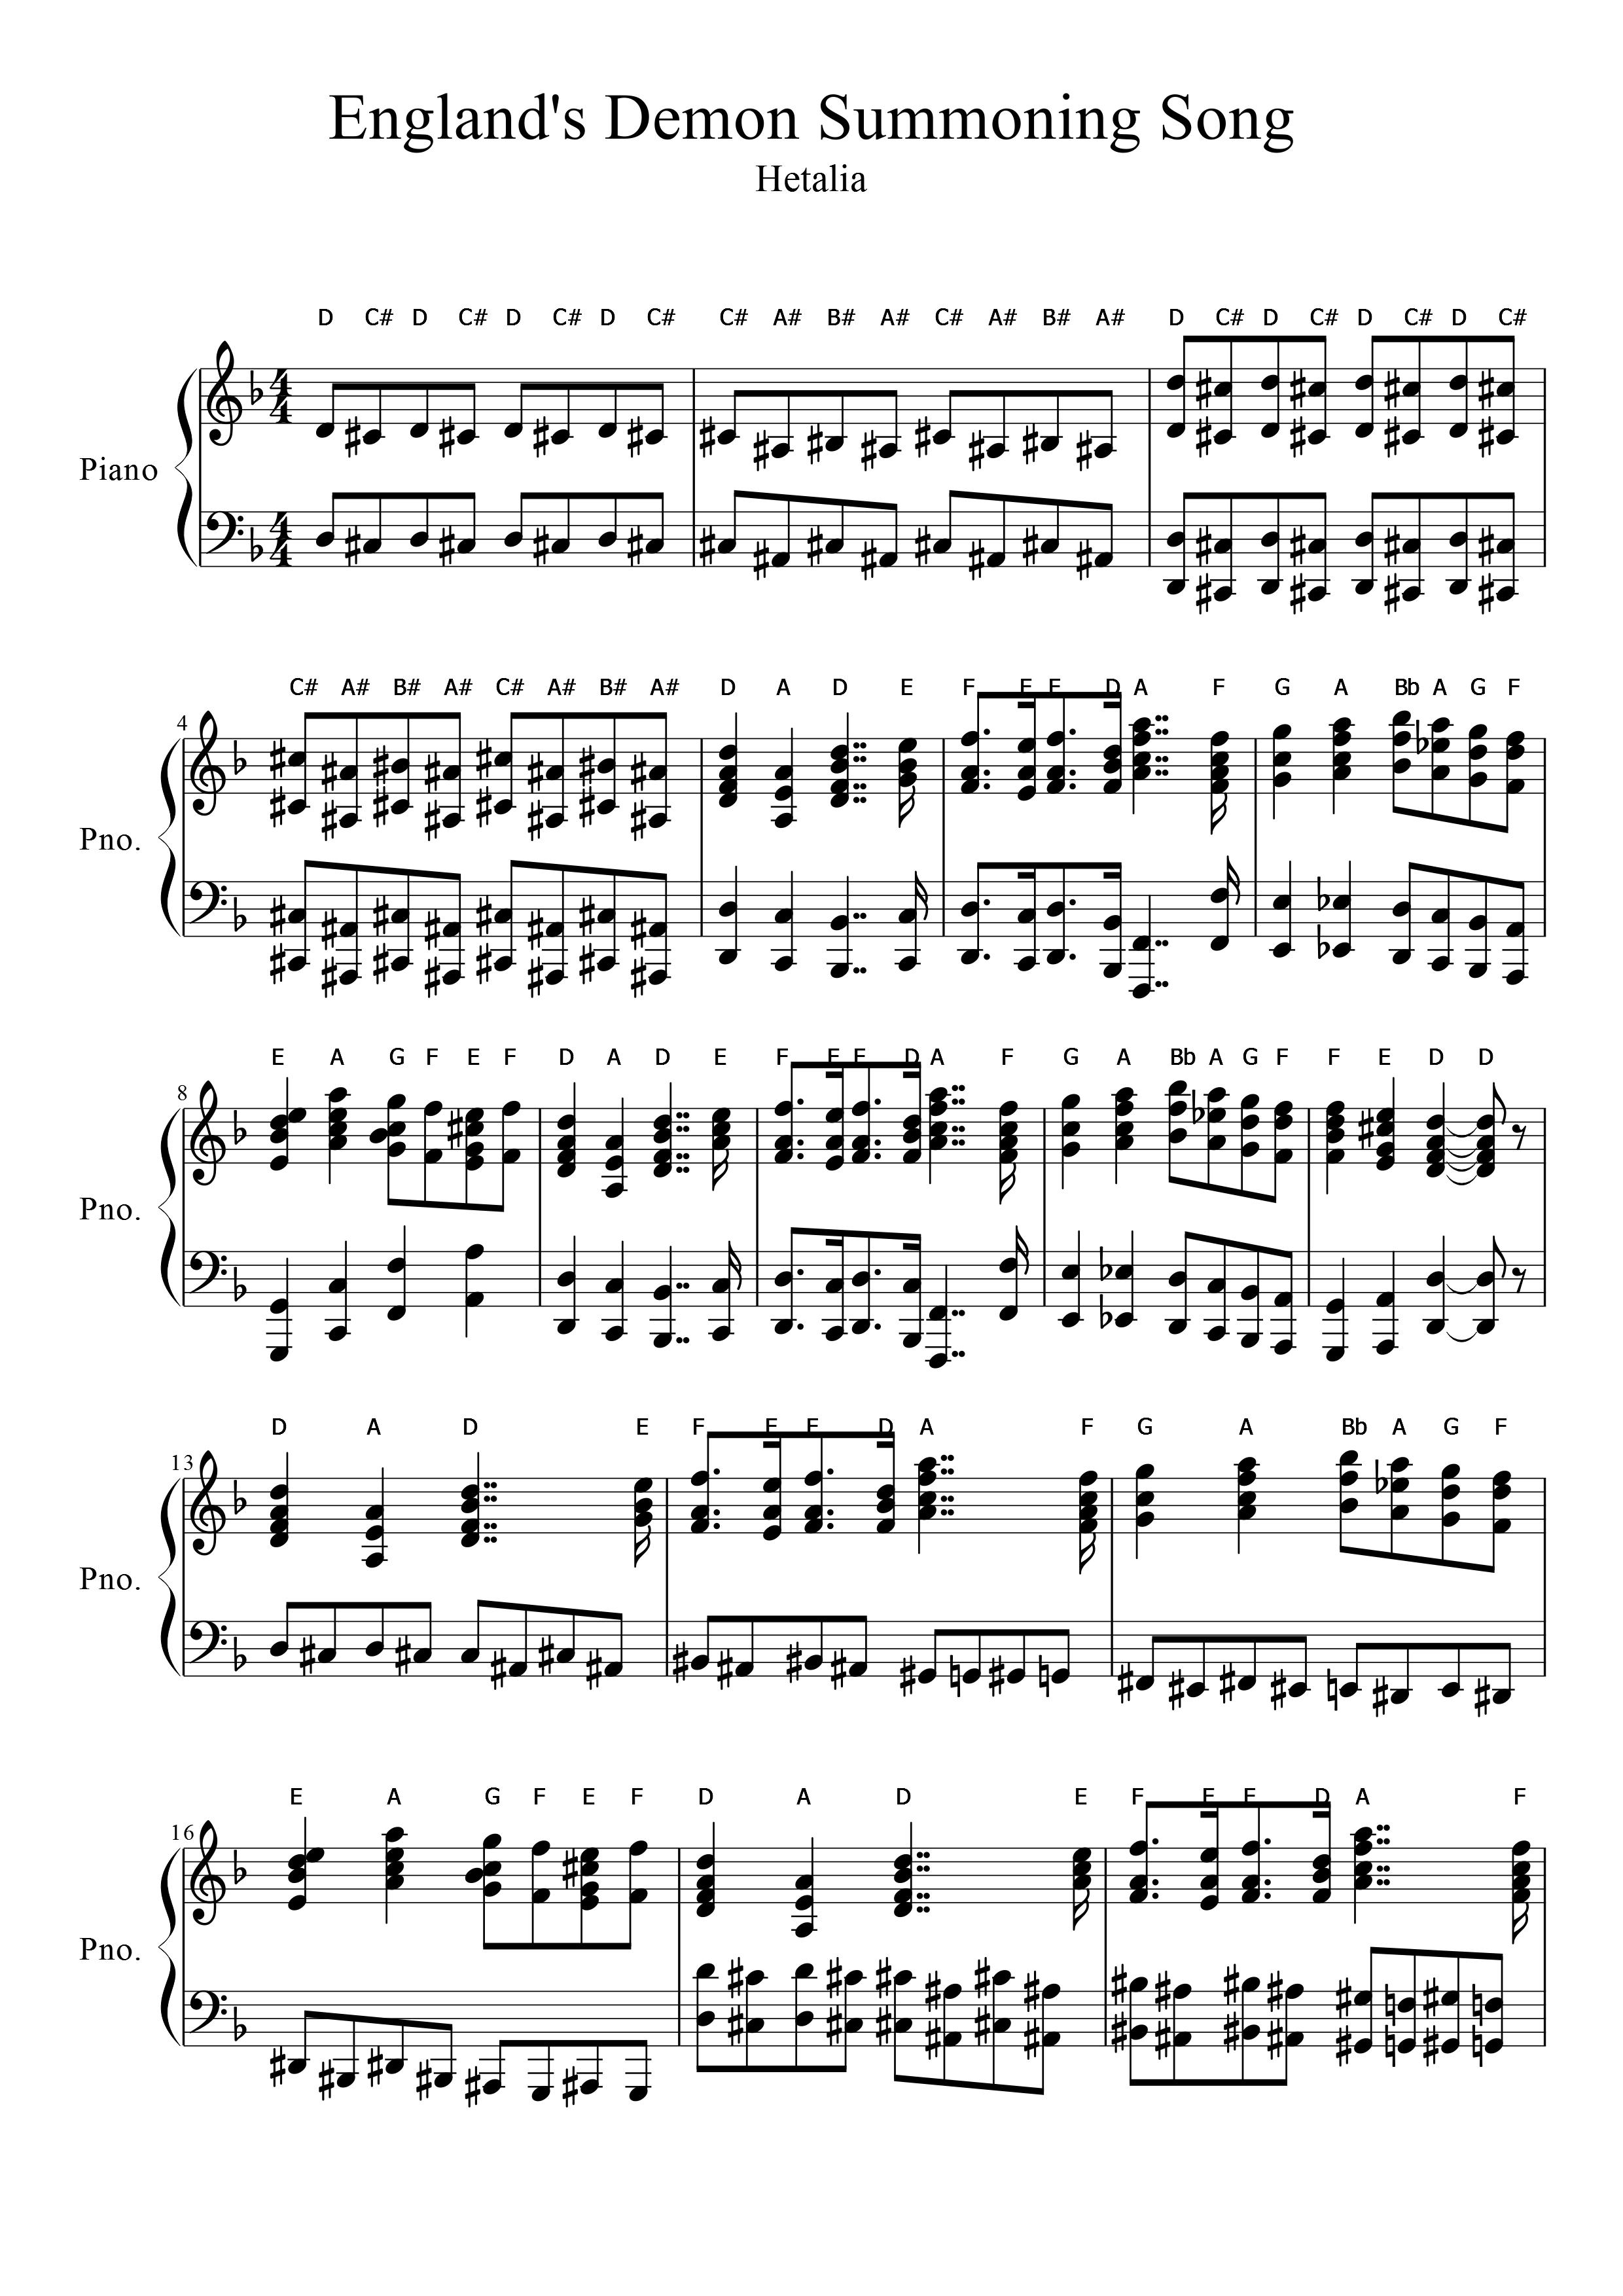 Piano Note Names on WorldwideSheetMusic - DeviantArt